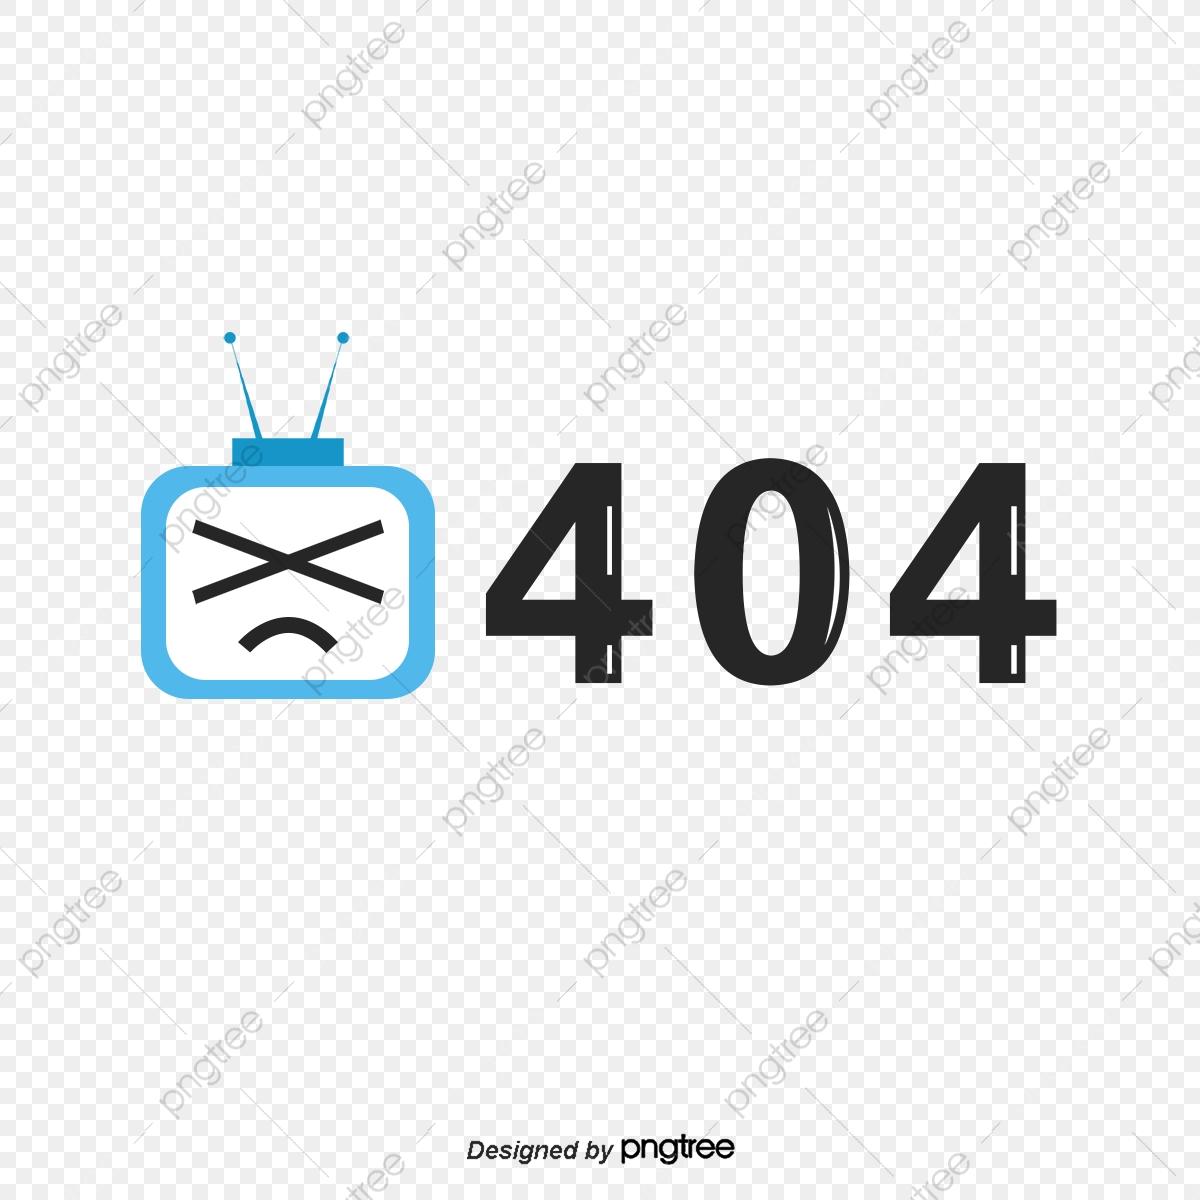 404 Error Page, 404, Error, Page Fault PNG Transparent Clipart Image.